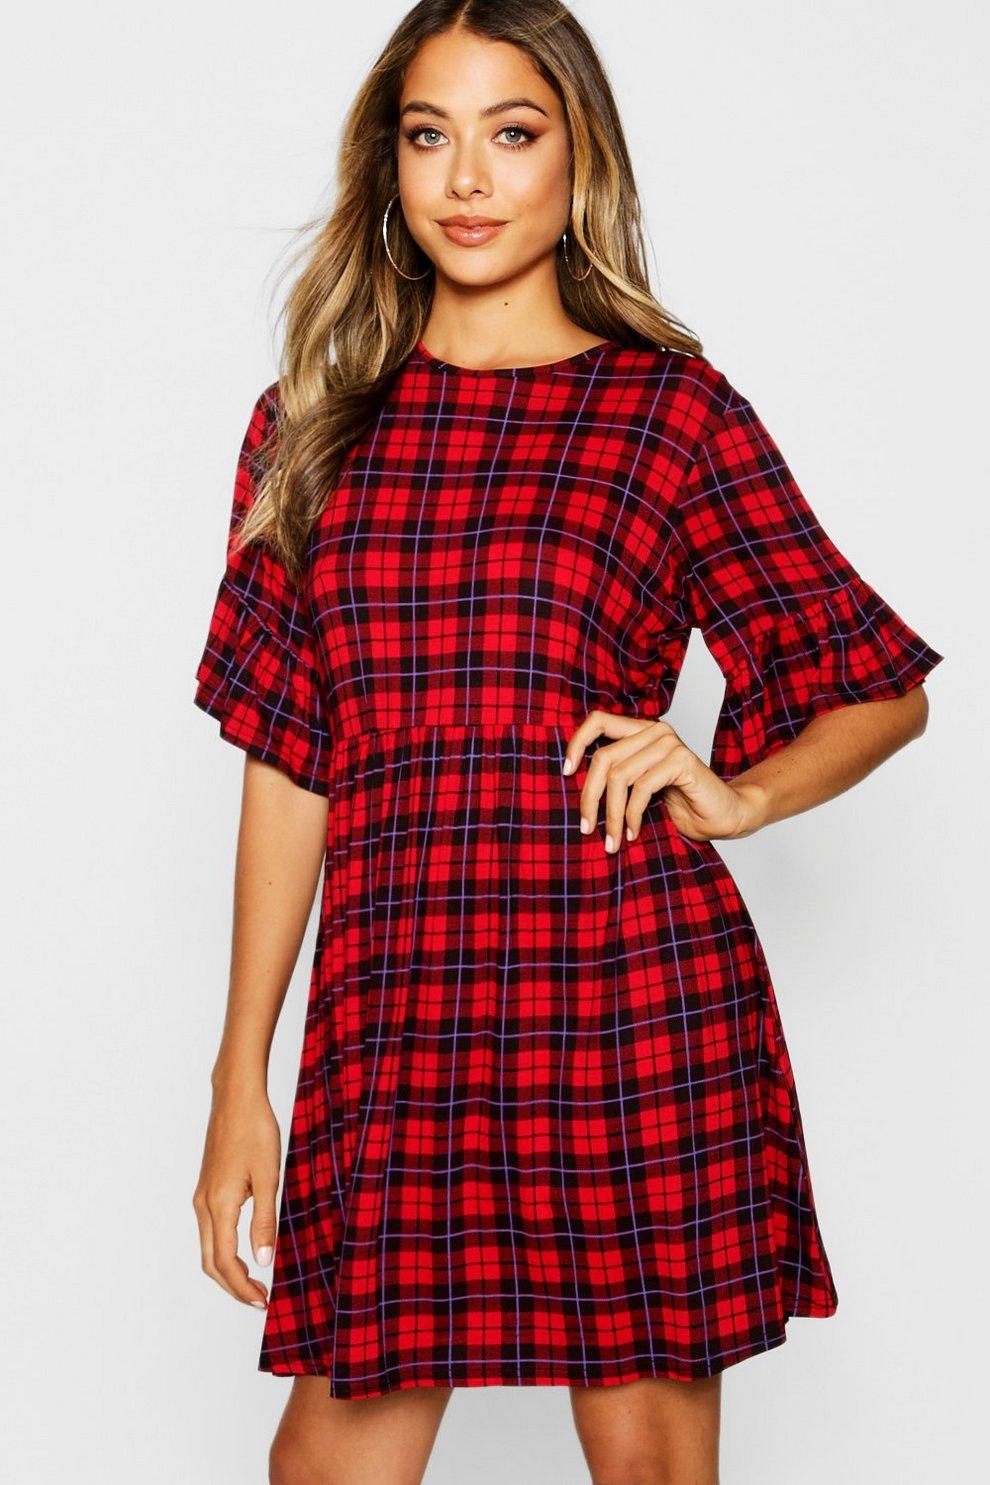 970e885f59 Checked Ruffle Sleeve Smock Dress